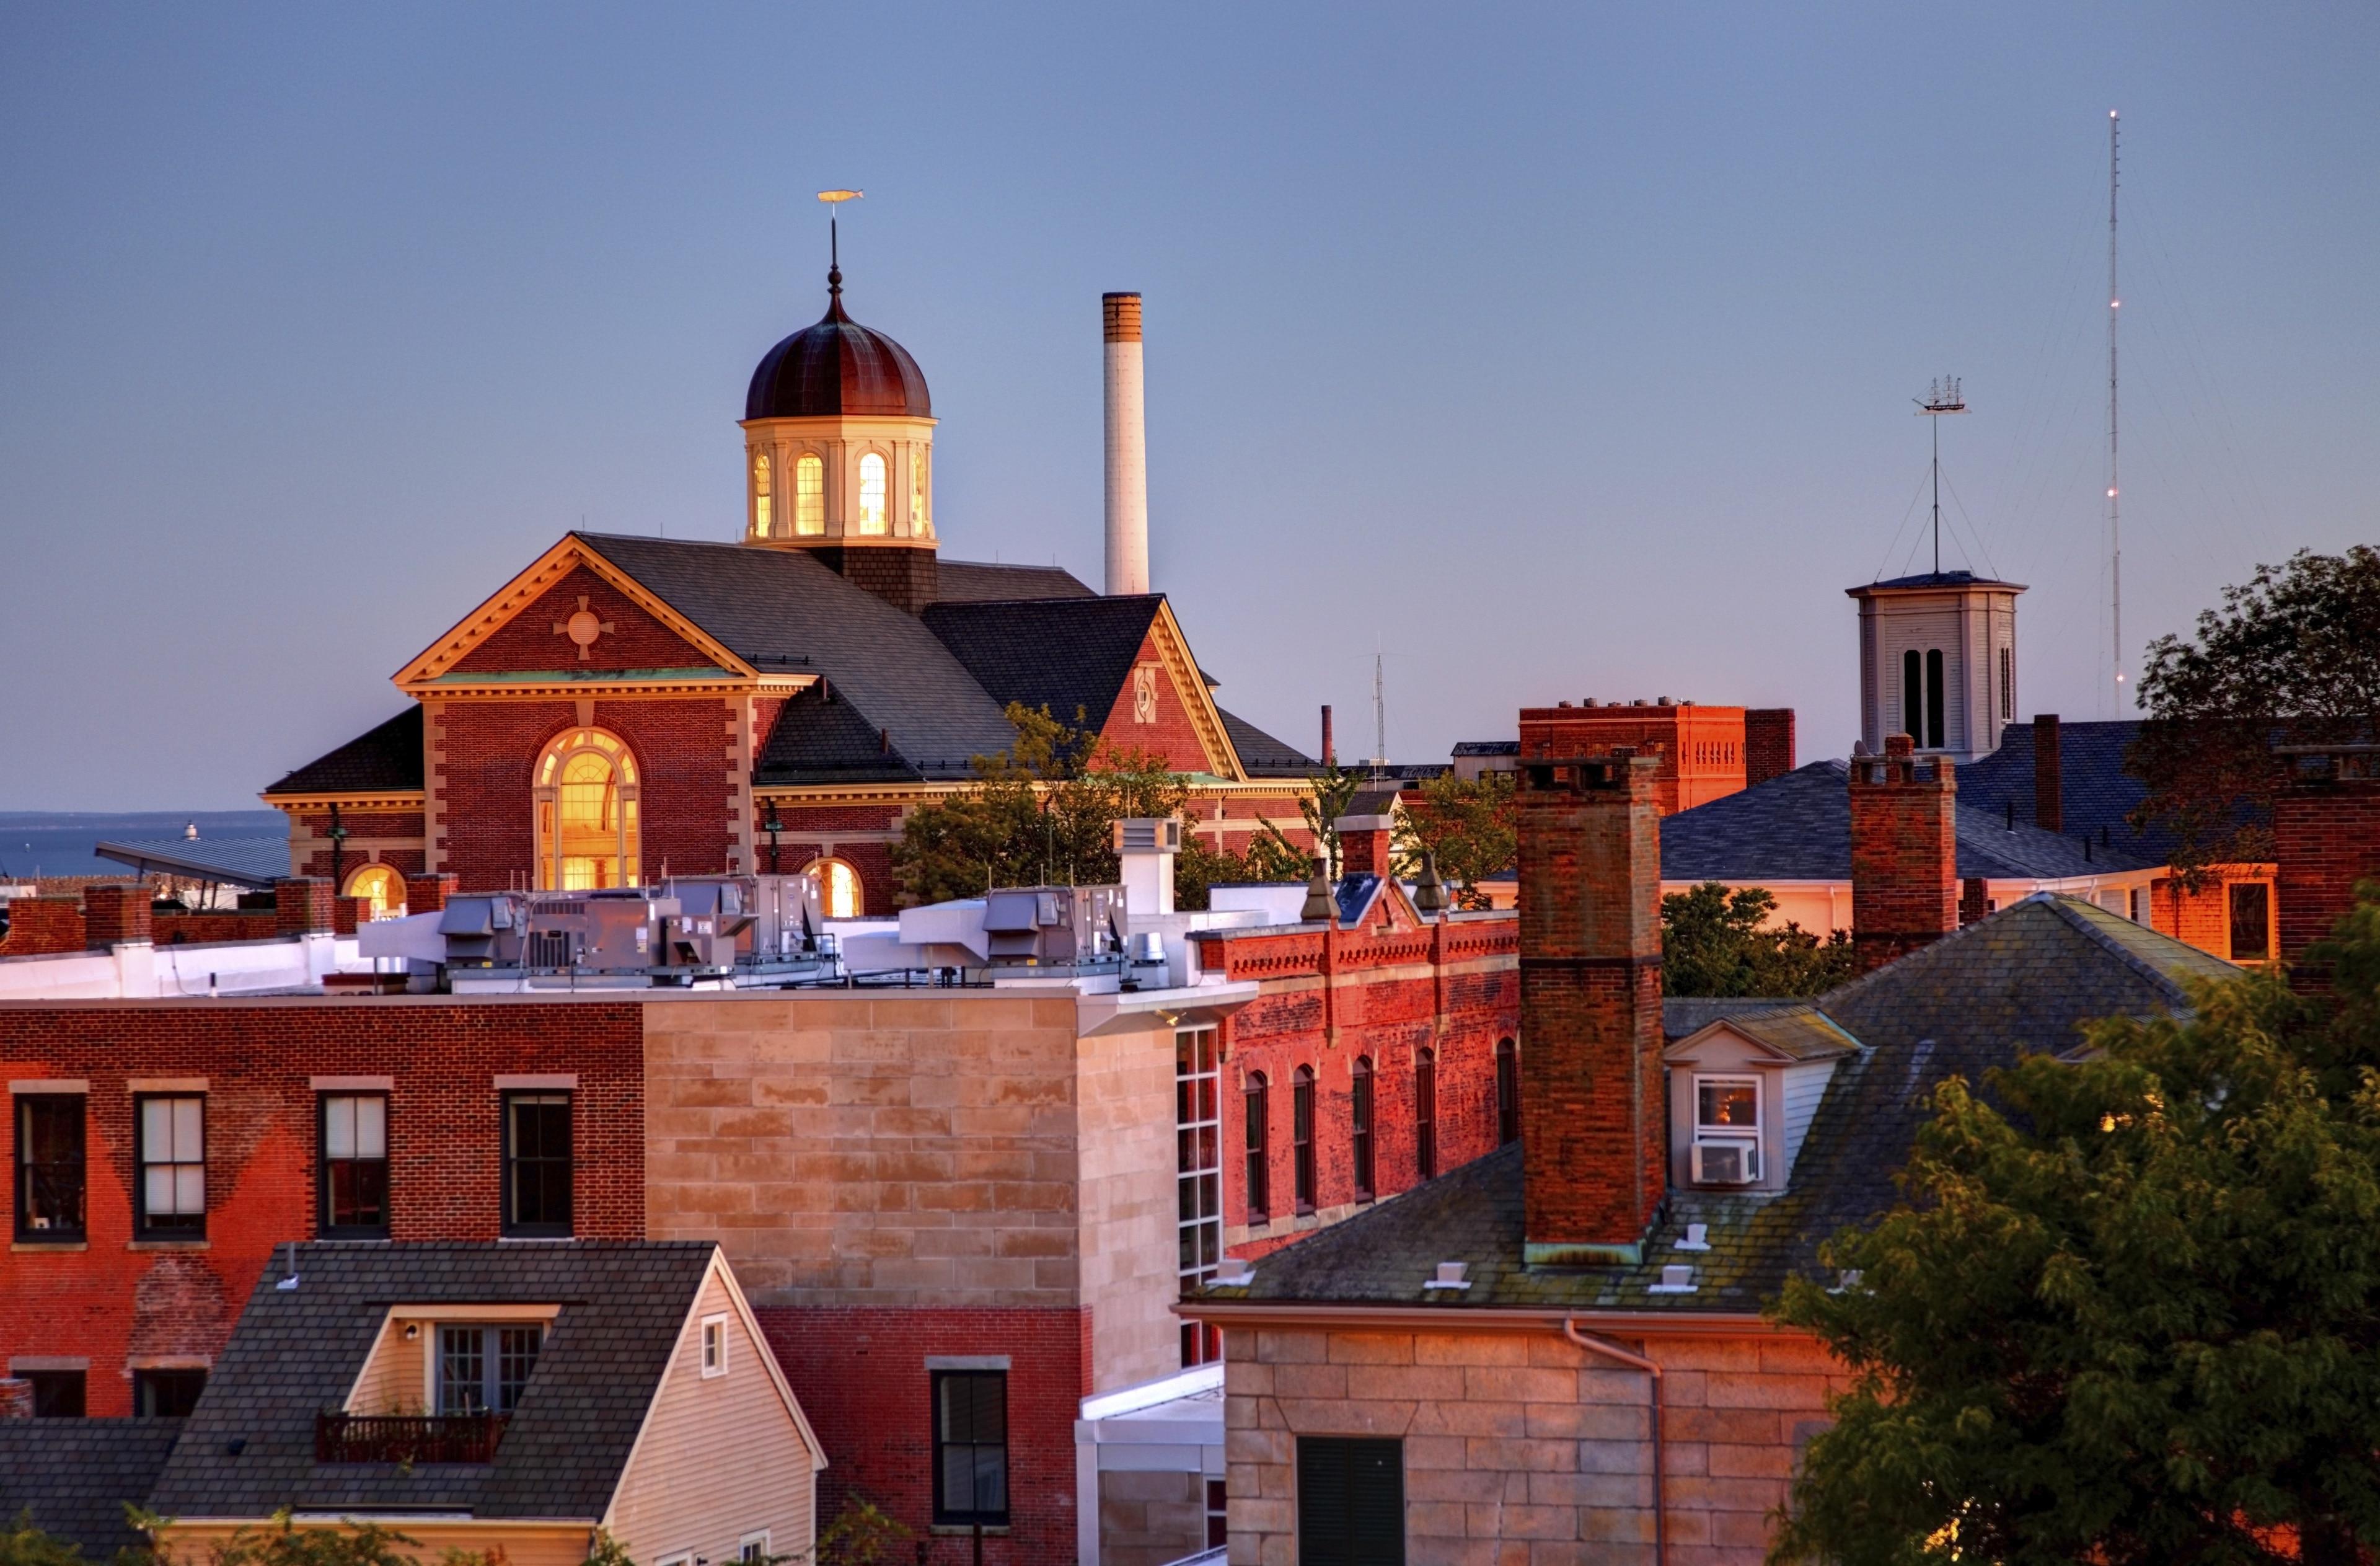 Bristol County, Massachusetts, United States of America